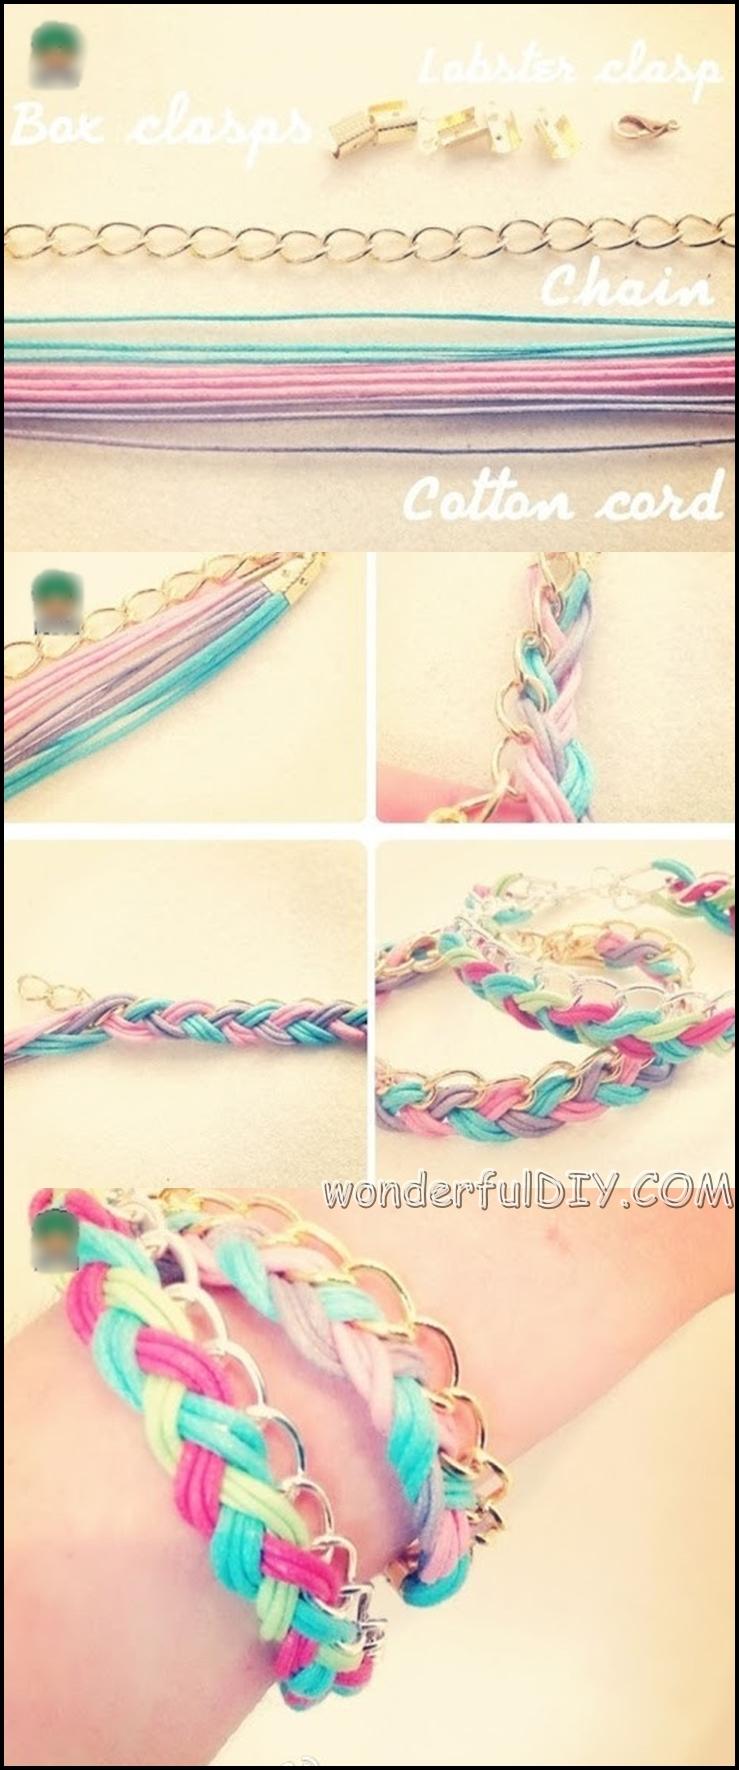 colorful braid bracelet m w